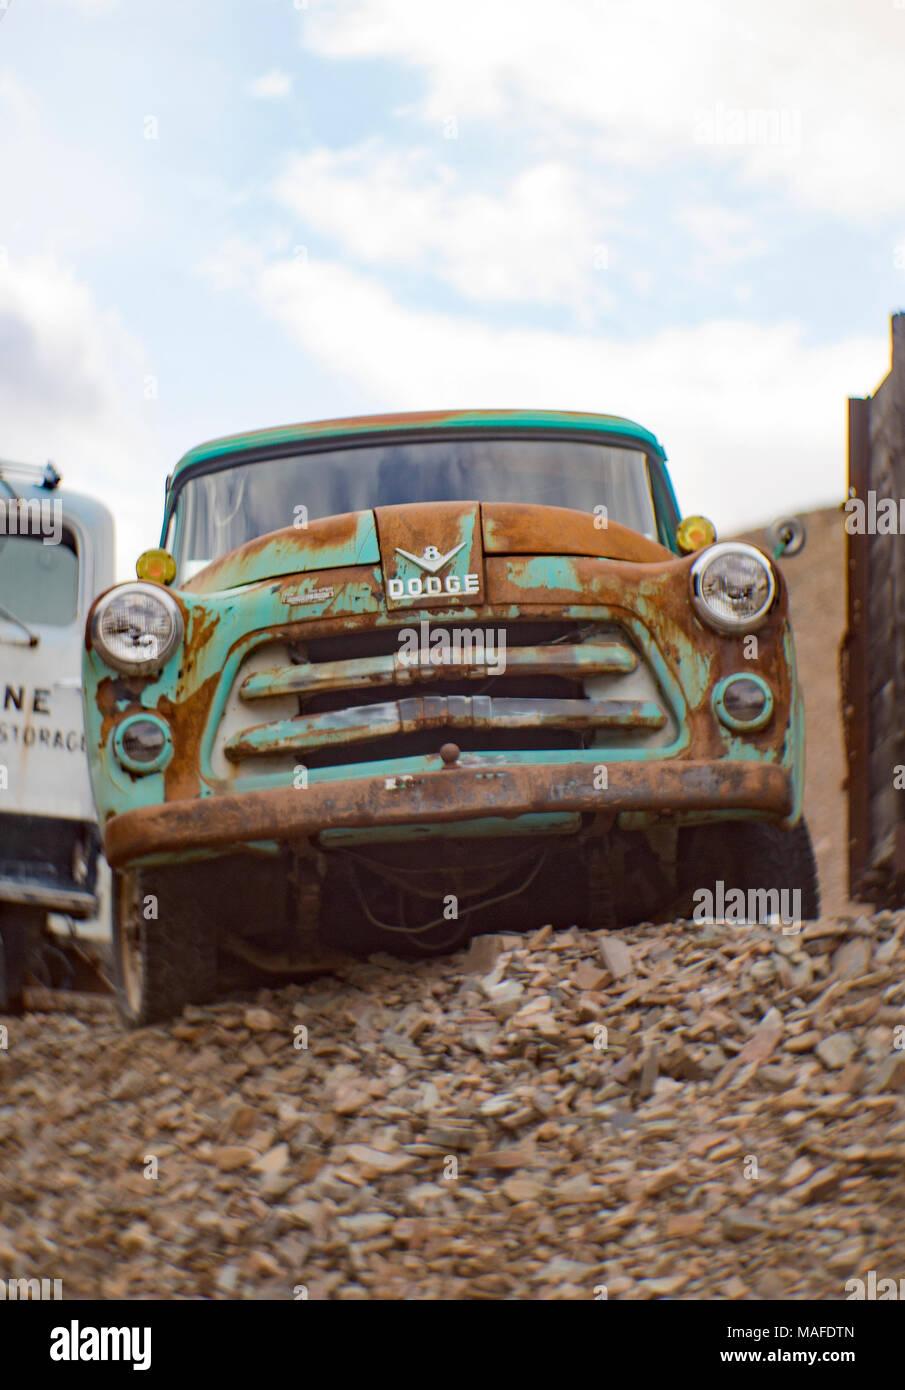 Old Pickup Trucks Stock Photos & Old Pickup Trucks Stock Images ...